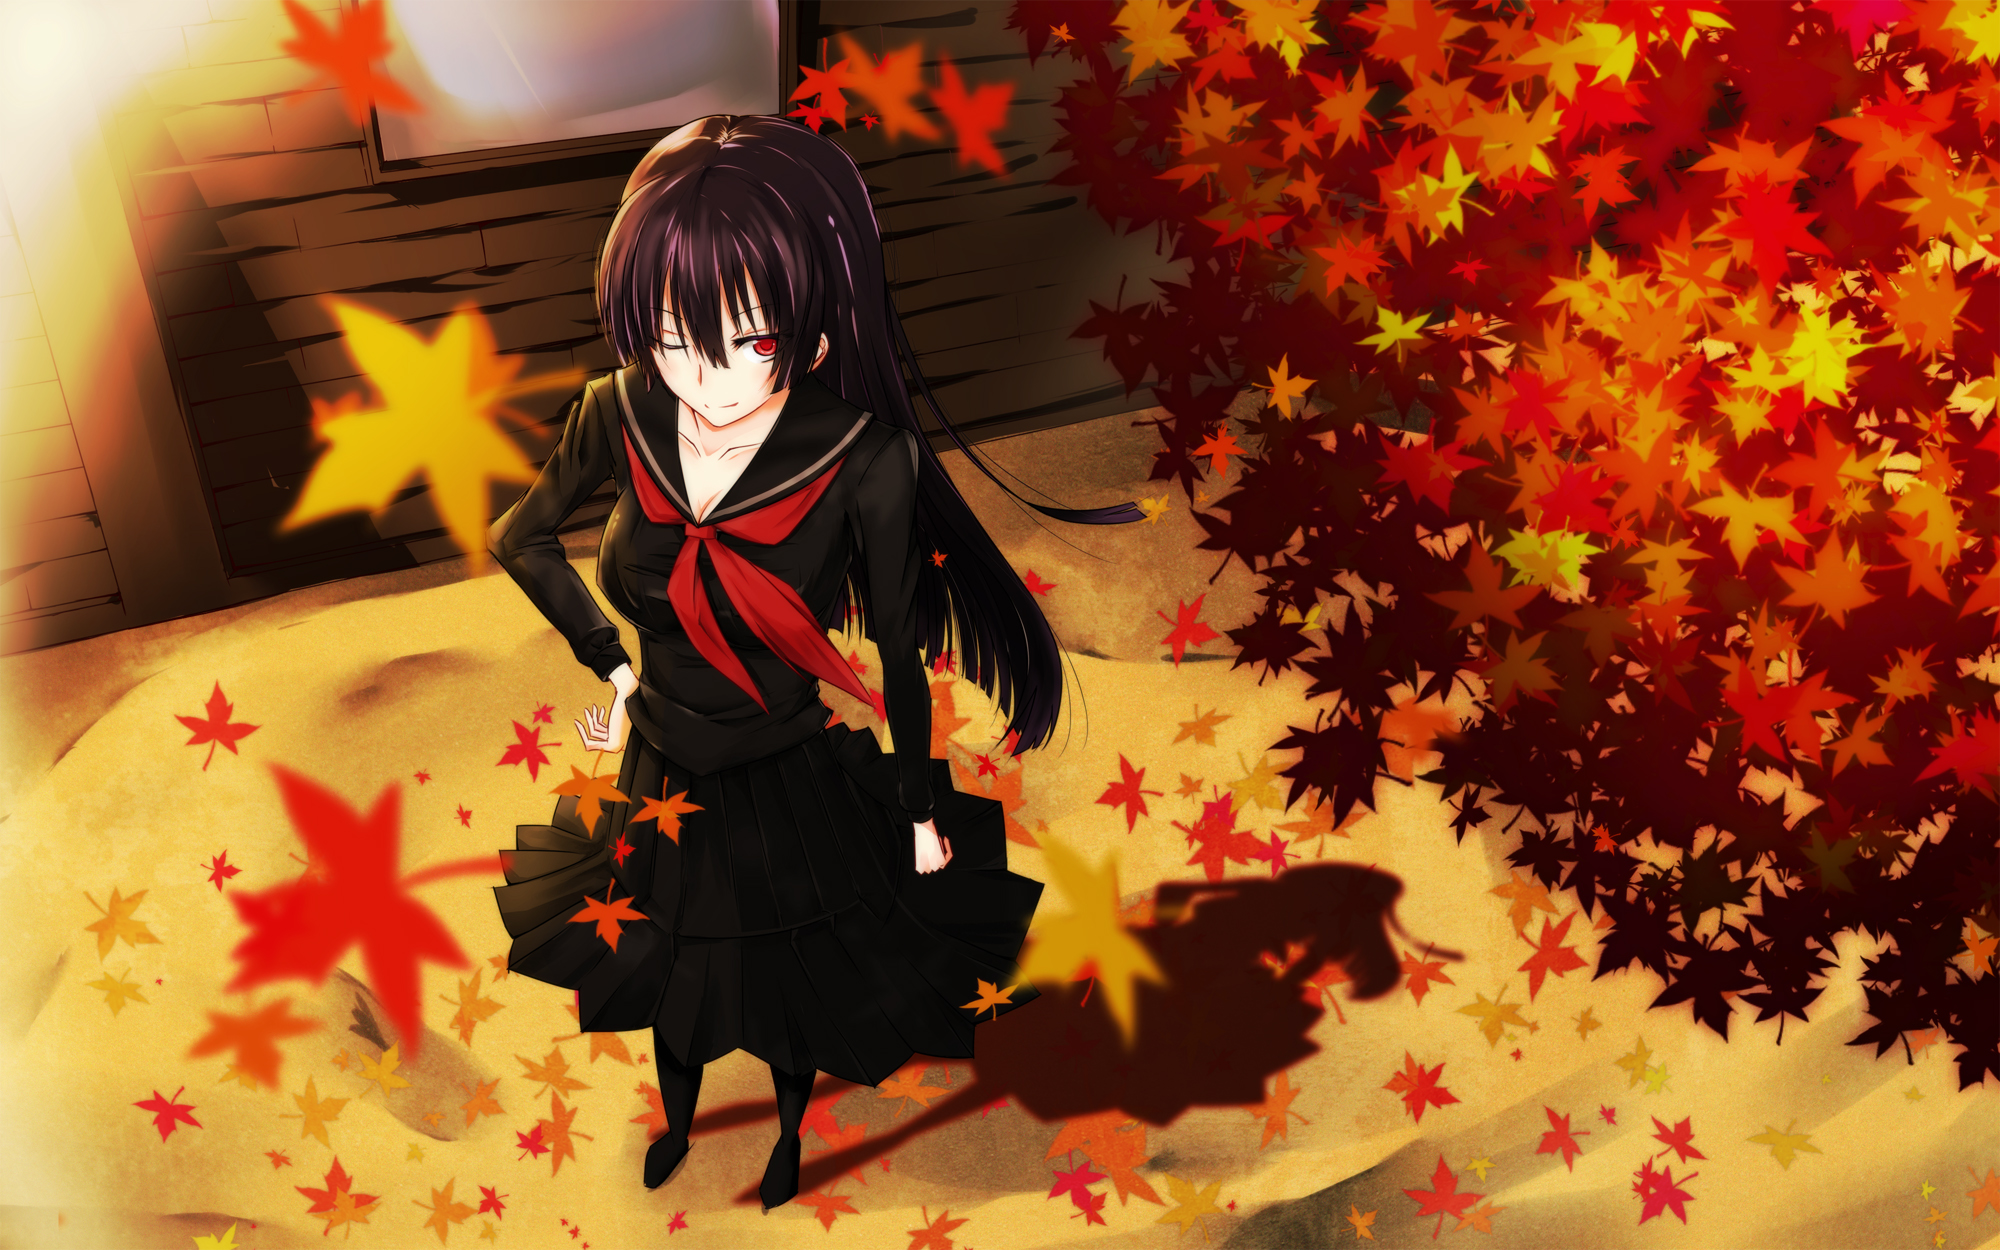 Autumn Anime Girl Wallpaper   2000x1250   ID:55837